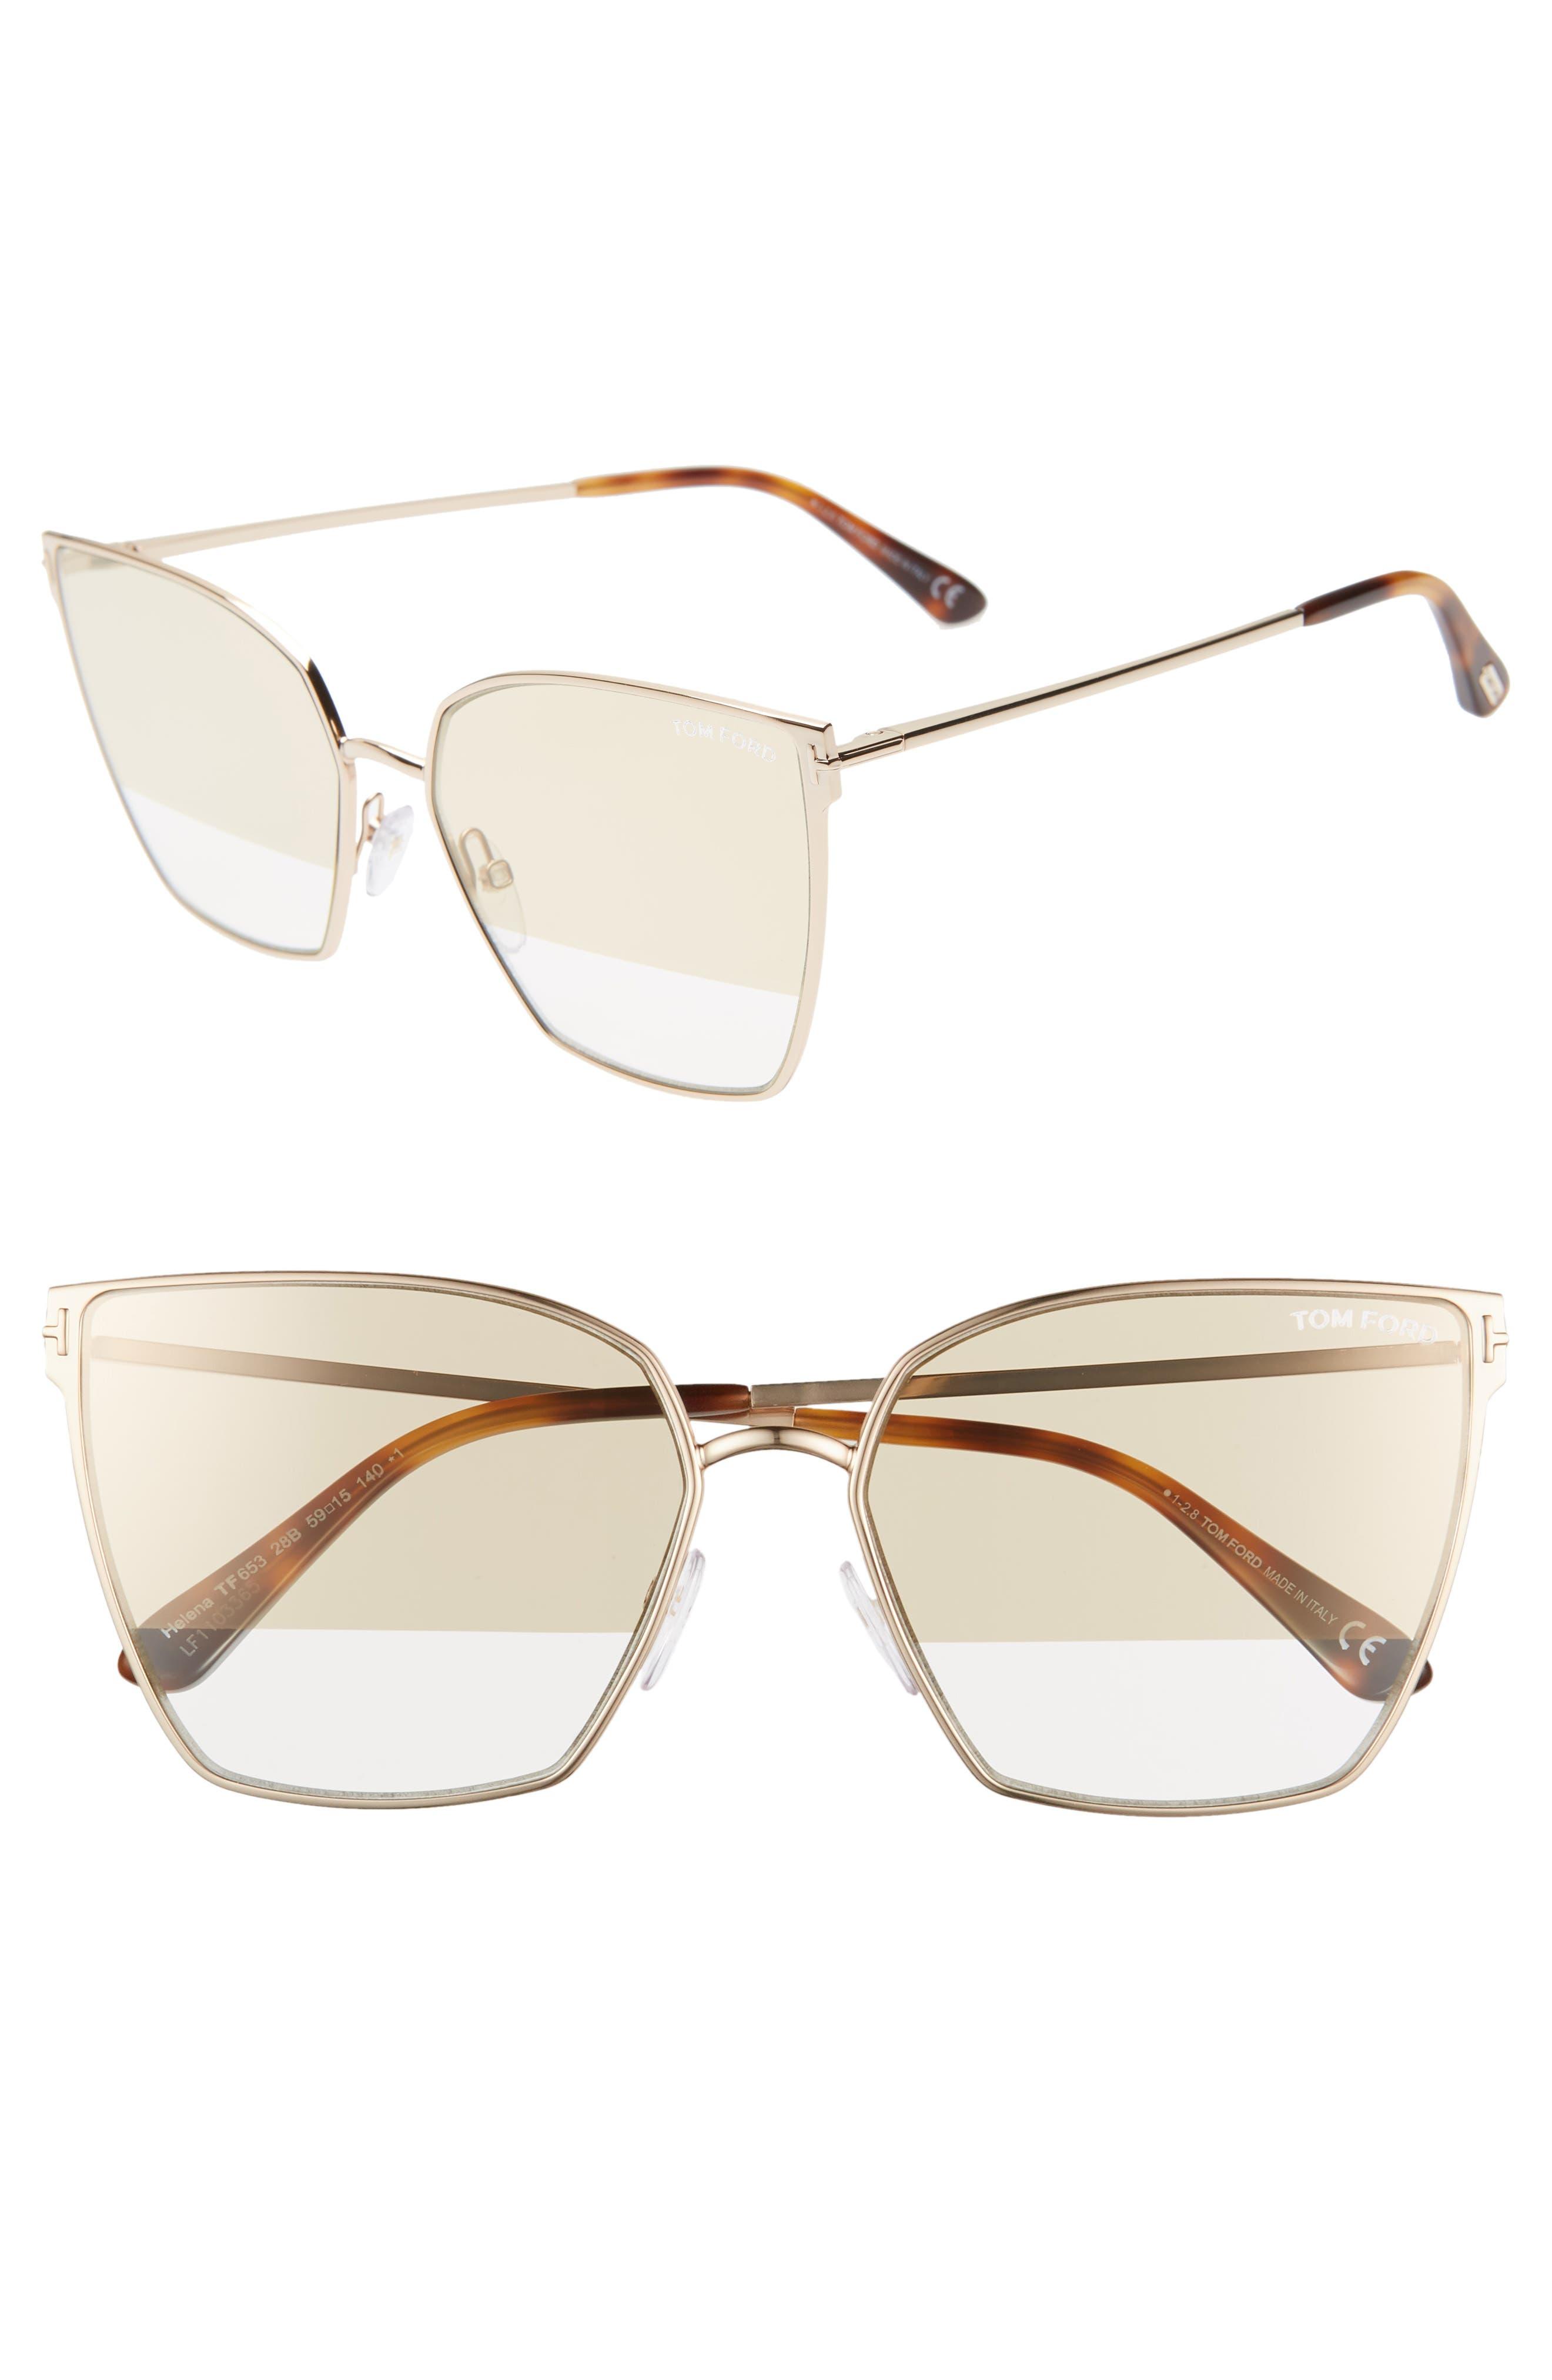 Image of Tom Ford Helena 59mm Cat Eye Sunglasses